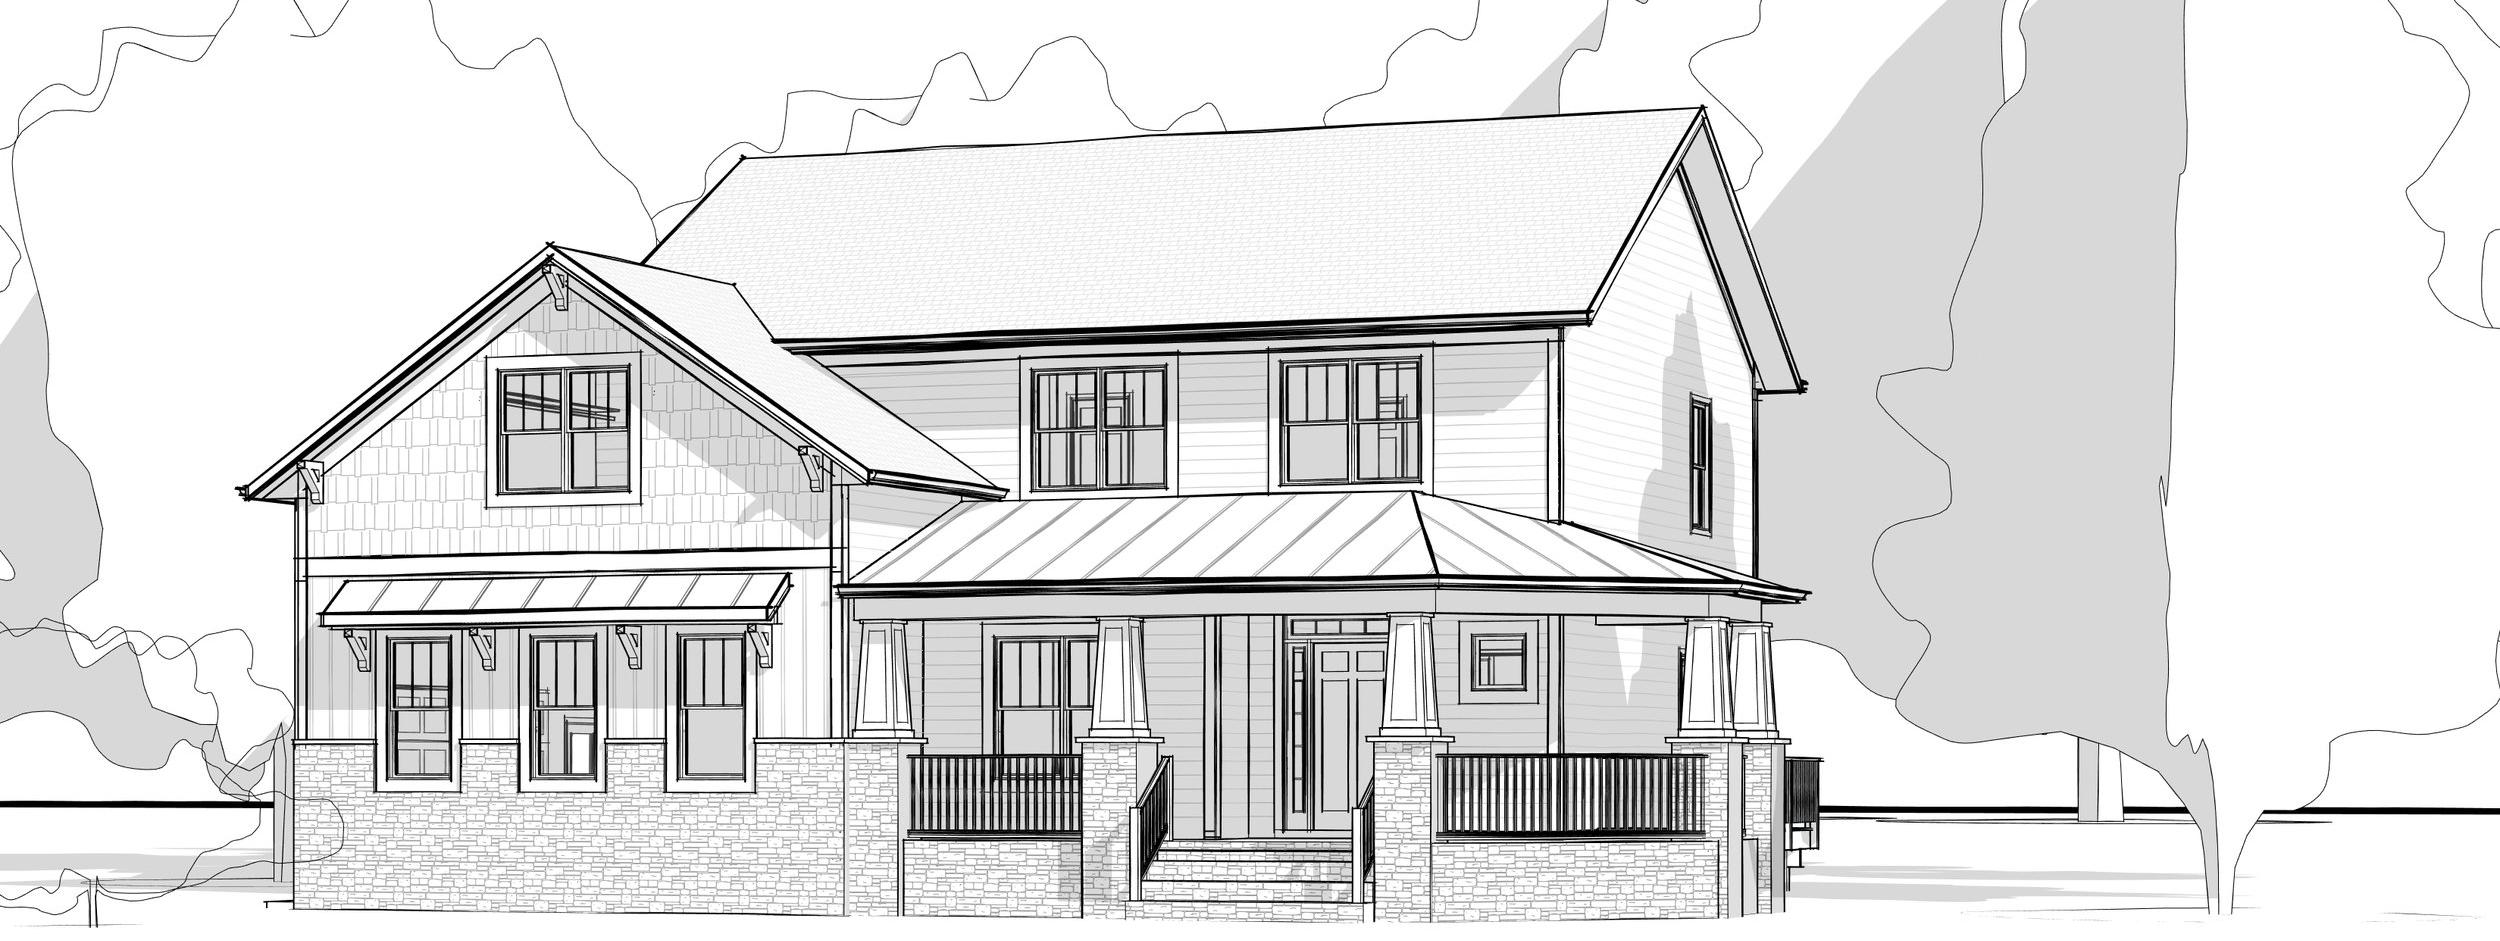 First Draft Custom Home Design